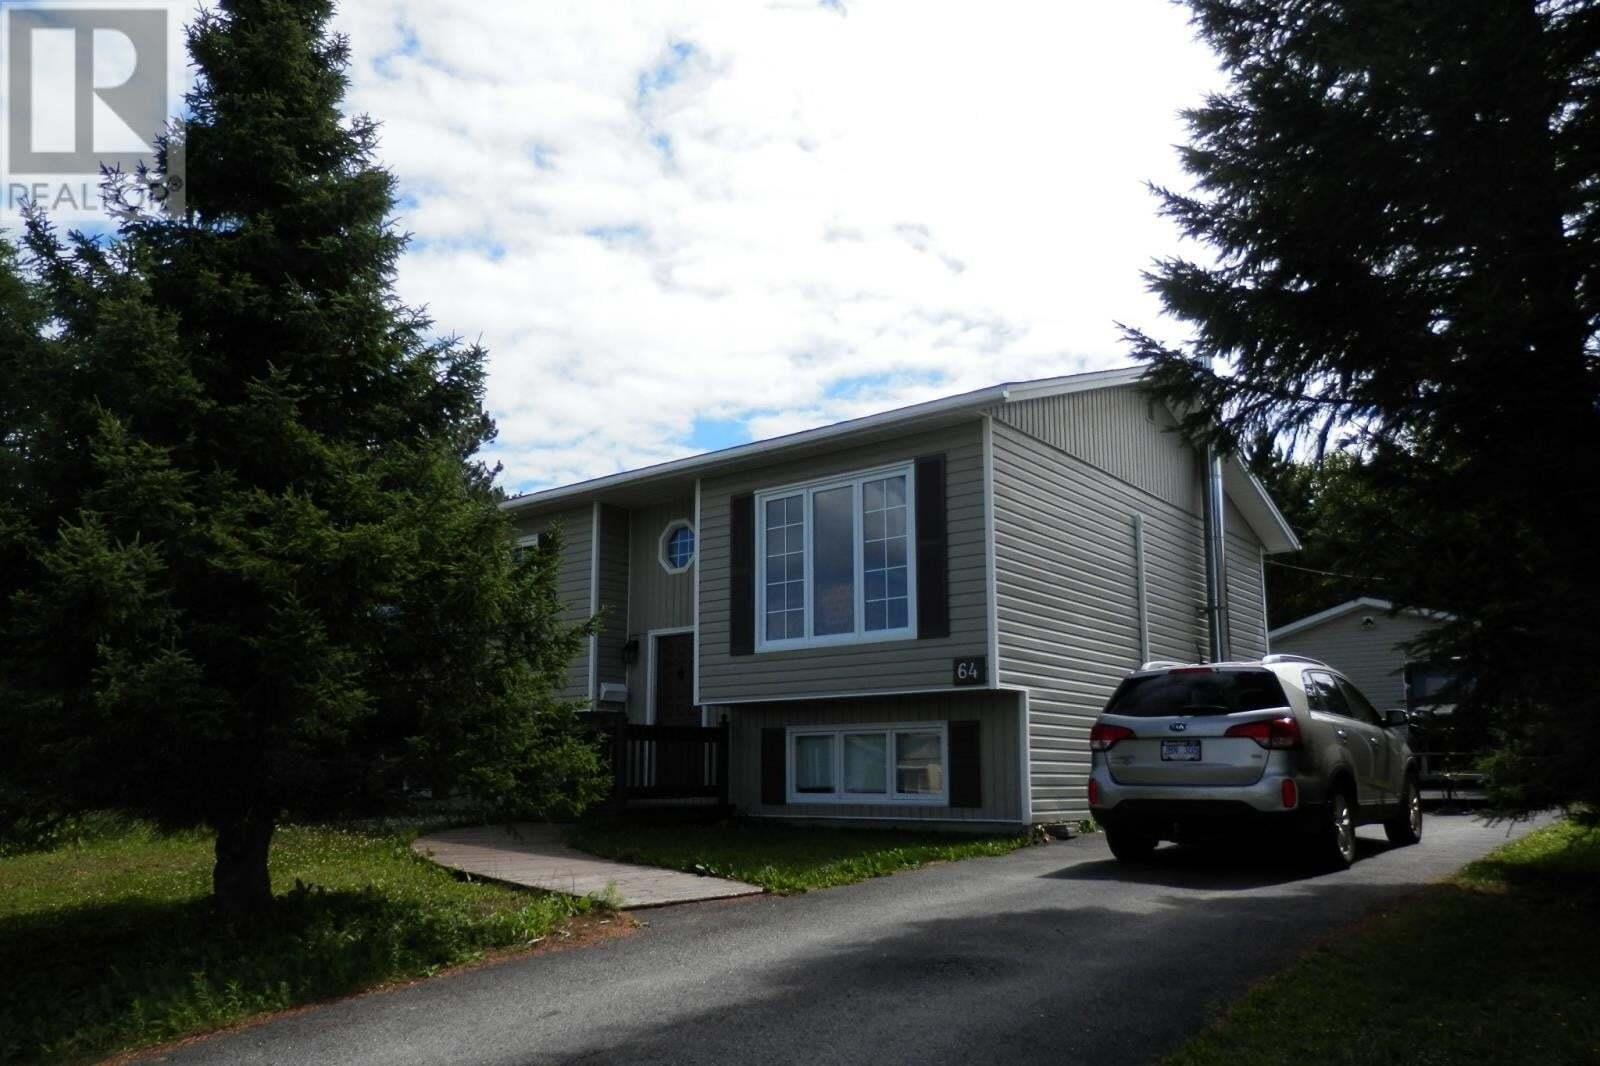 House for sale at 64 Raynham Ave Gander Newfoundland - MLS: 1218284